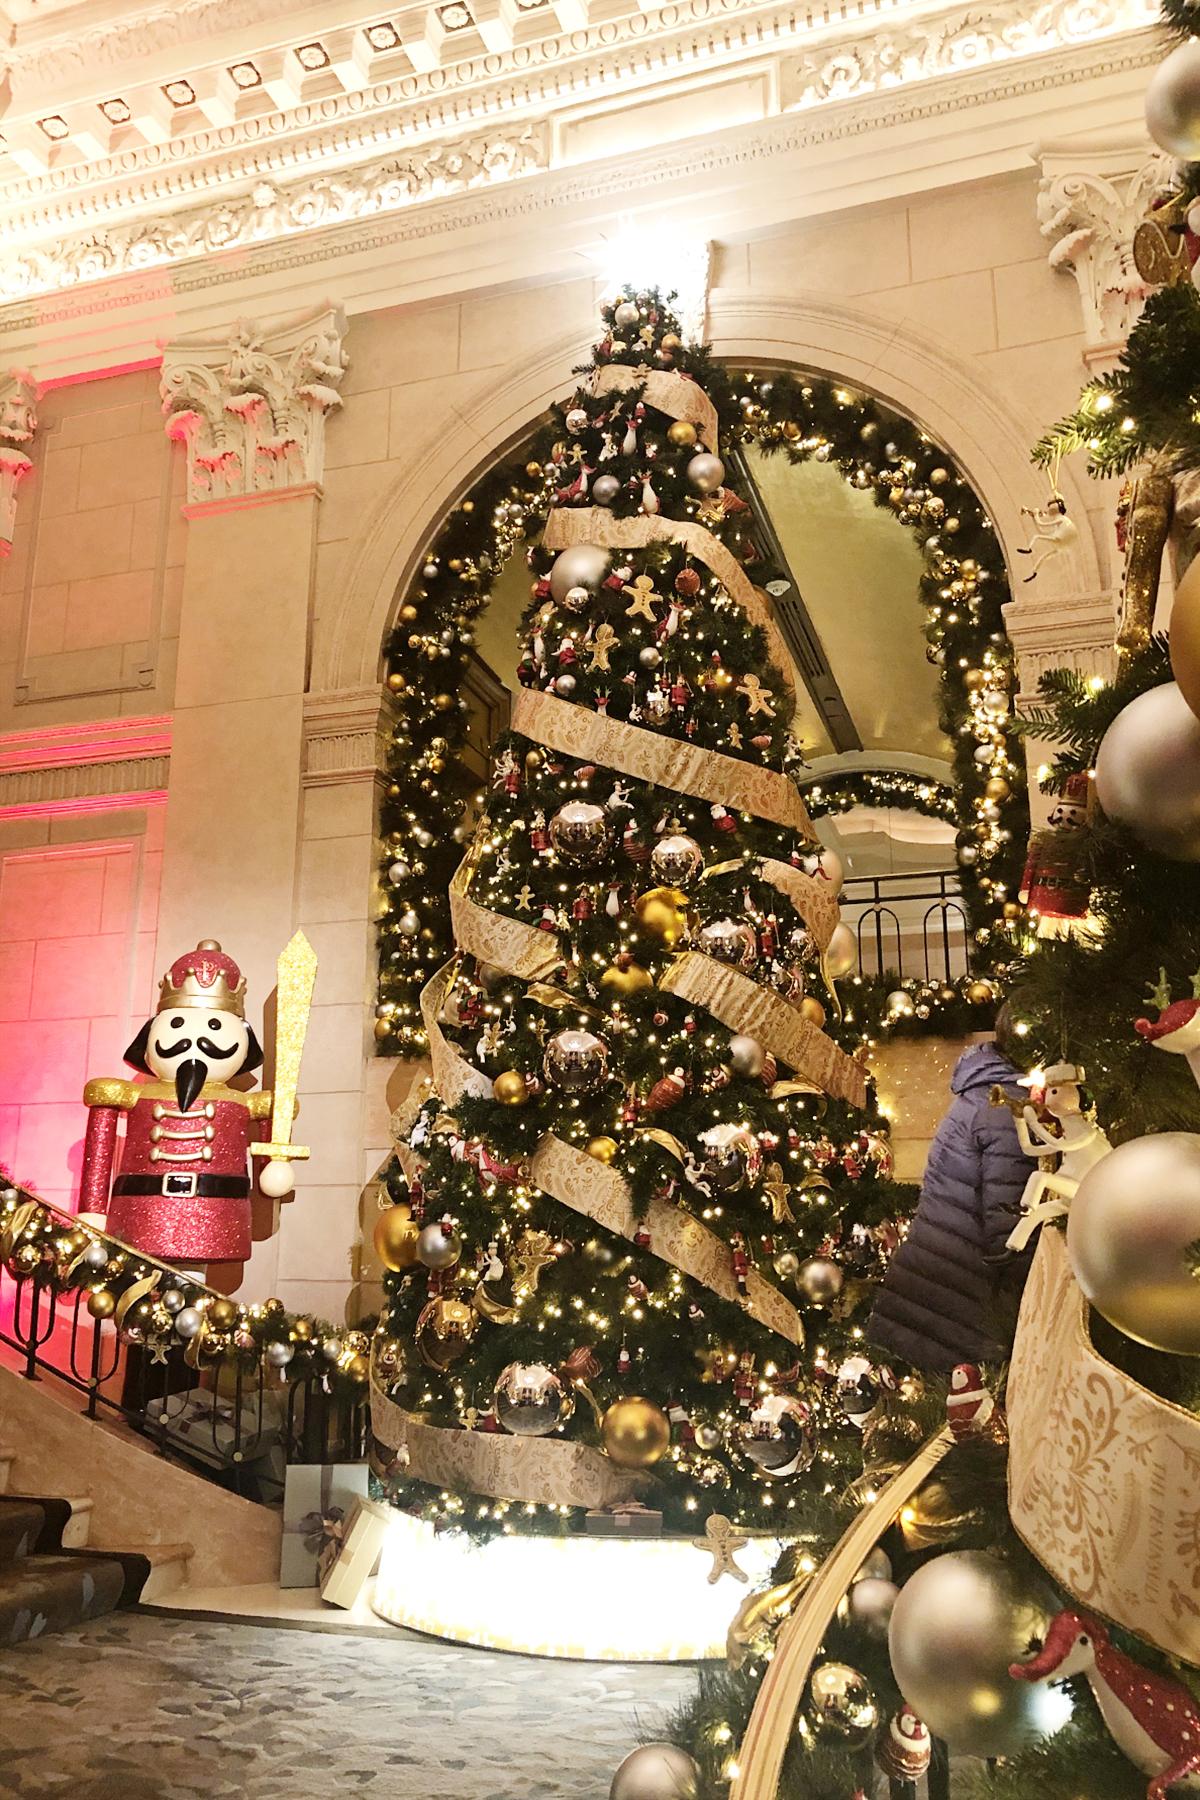 The peninsula nyc christmas decorations